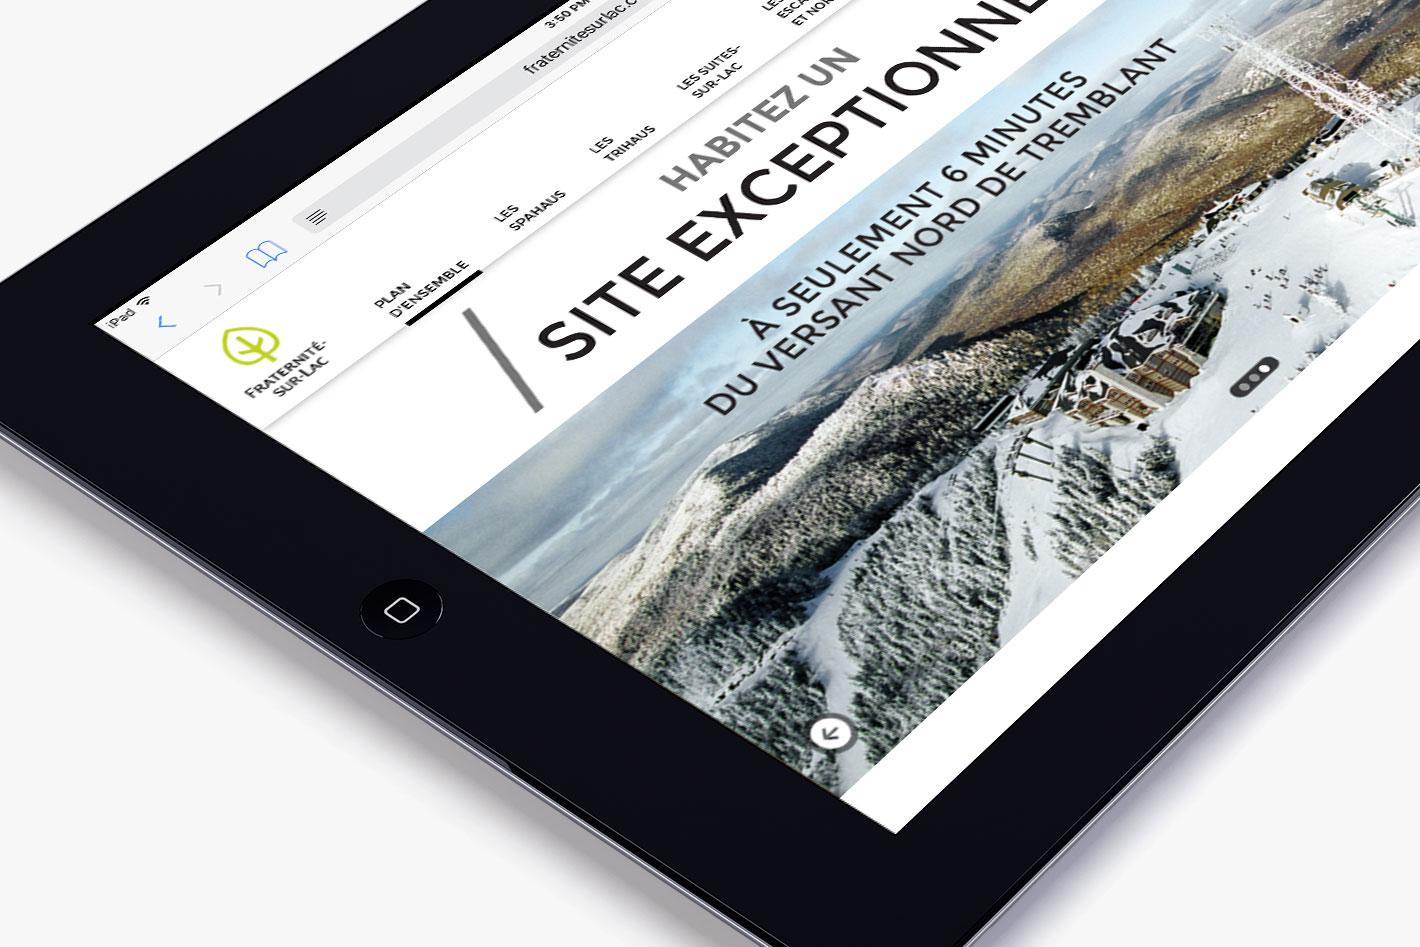 Fraternite_IMGS_1420x947-iPad-Angle